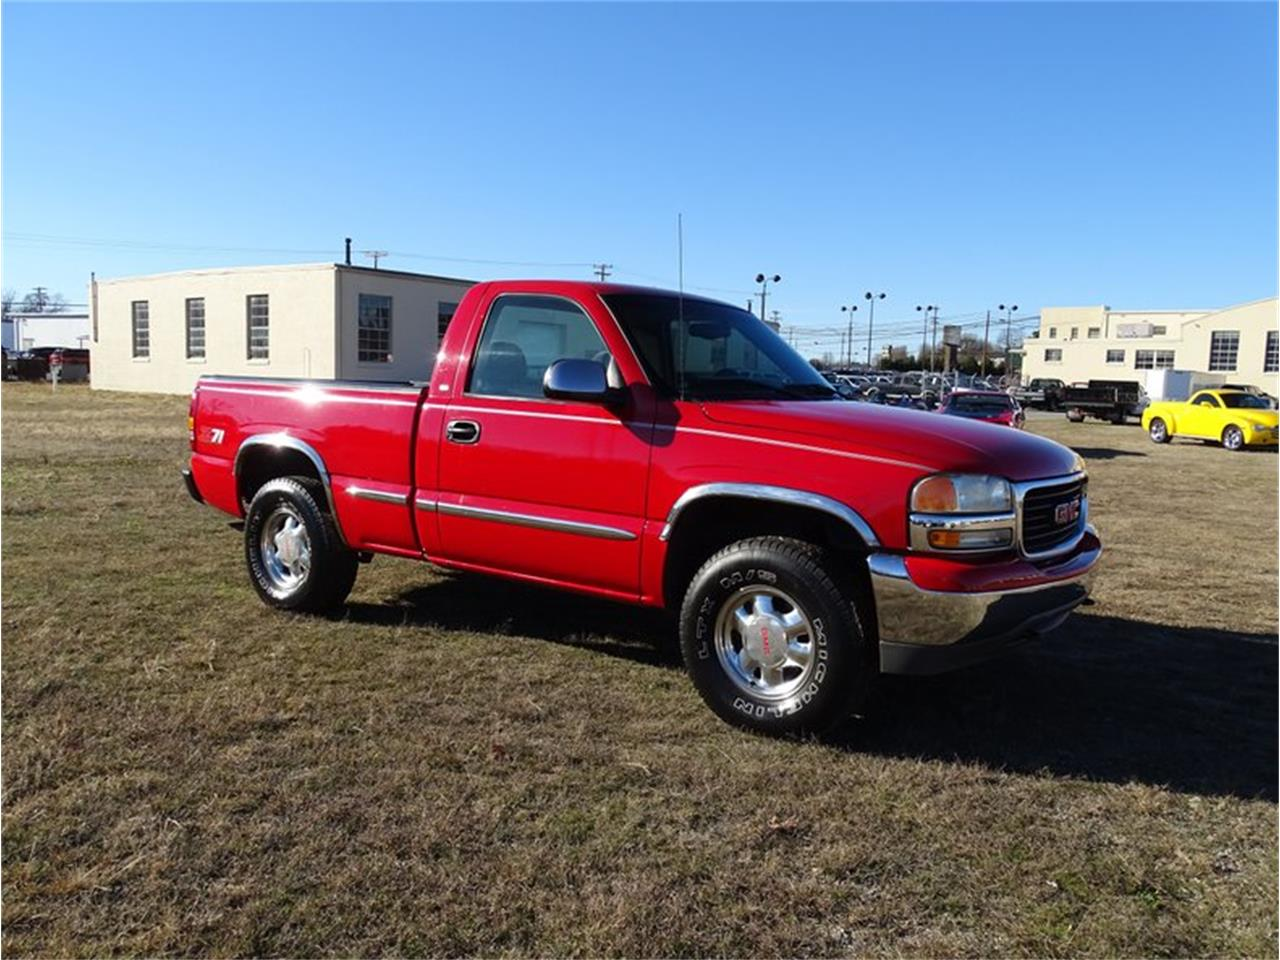 for sale at auction 1999 gmc sierra in greensboro, north carolina cars - greensboro, nc at geebo